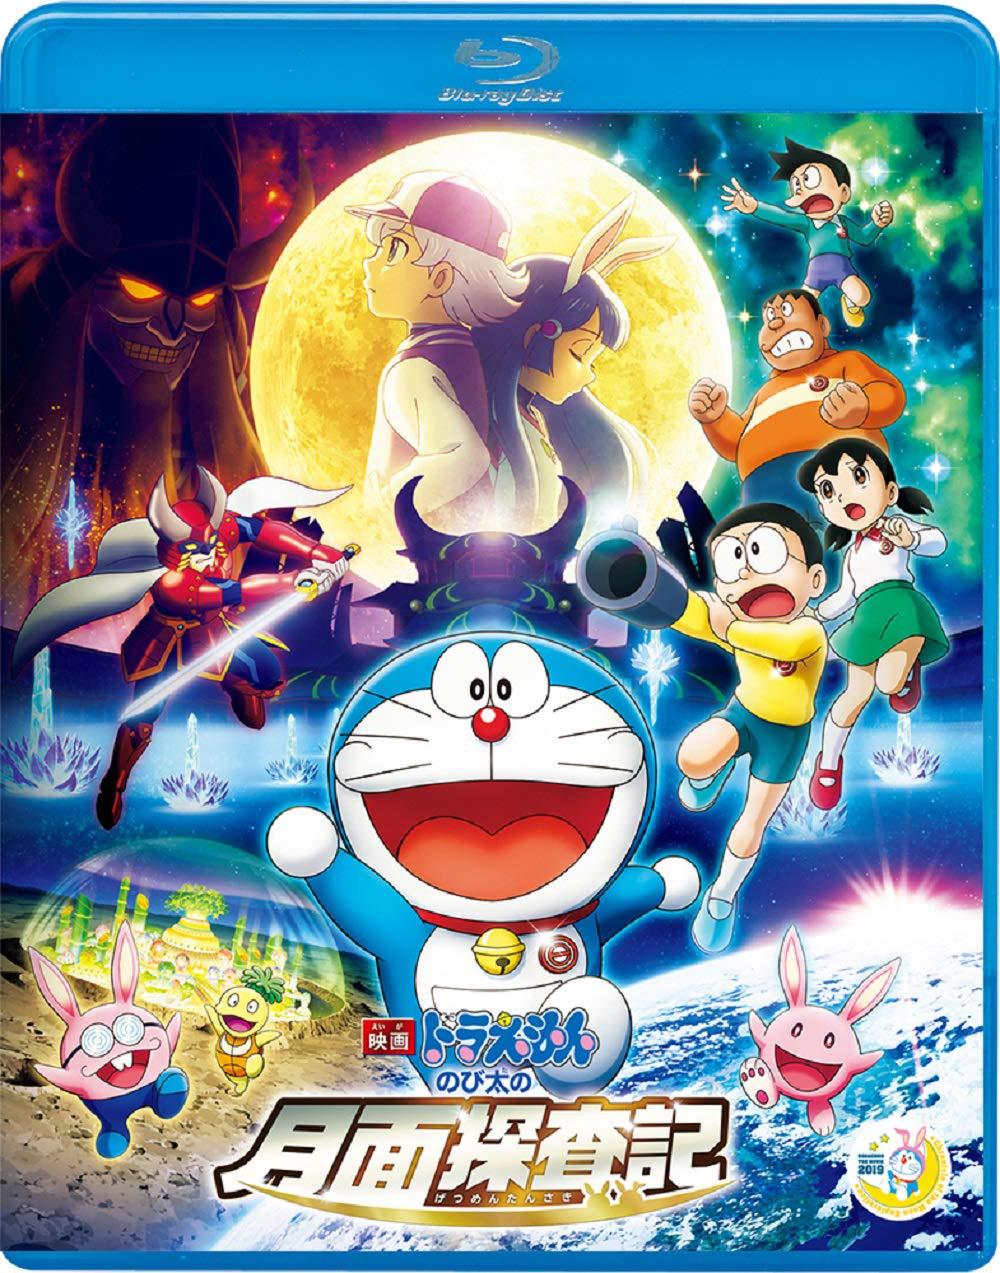 Doraemon: Nobita's Chronicle of the Moon Exploration Blu-ray